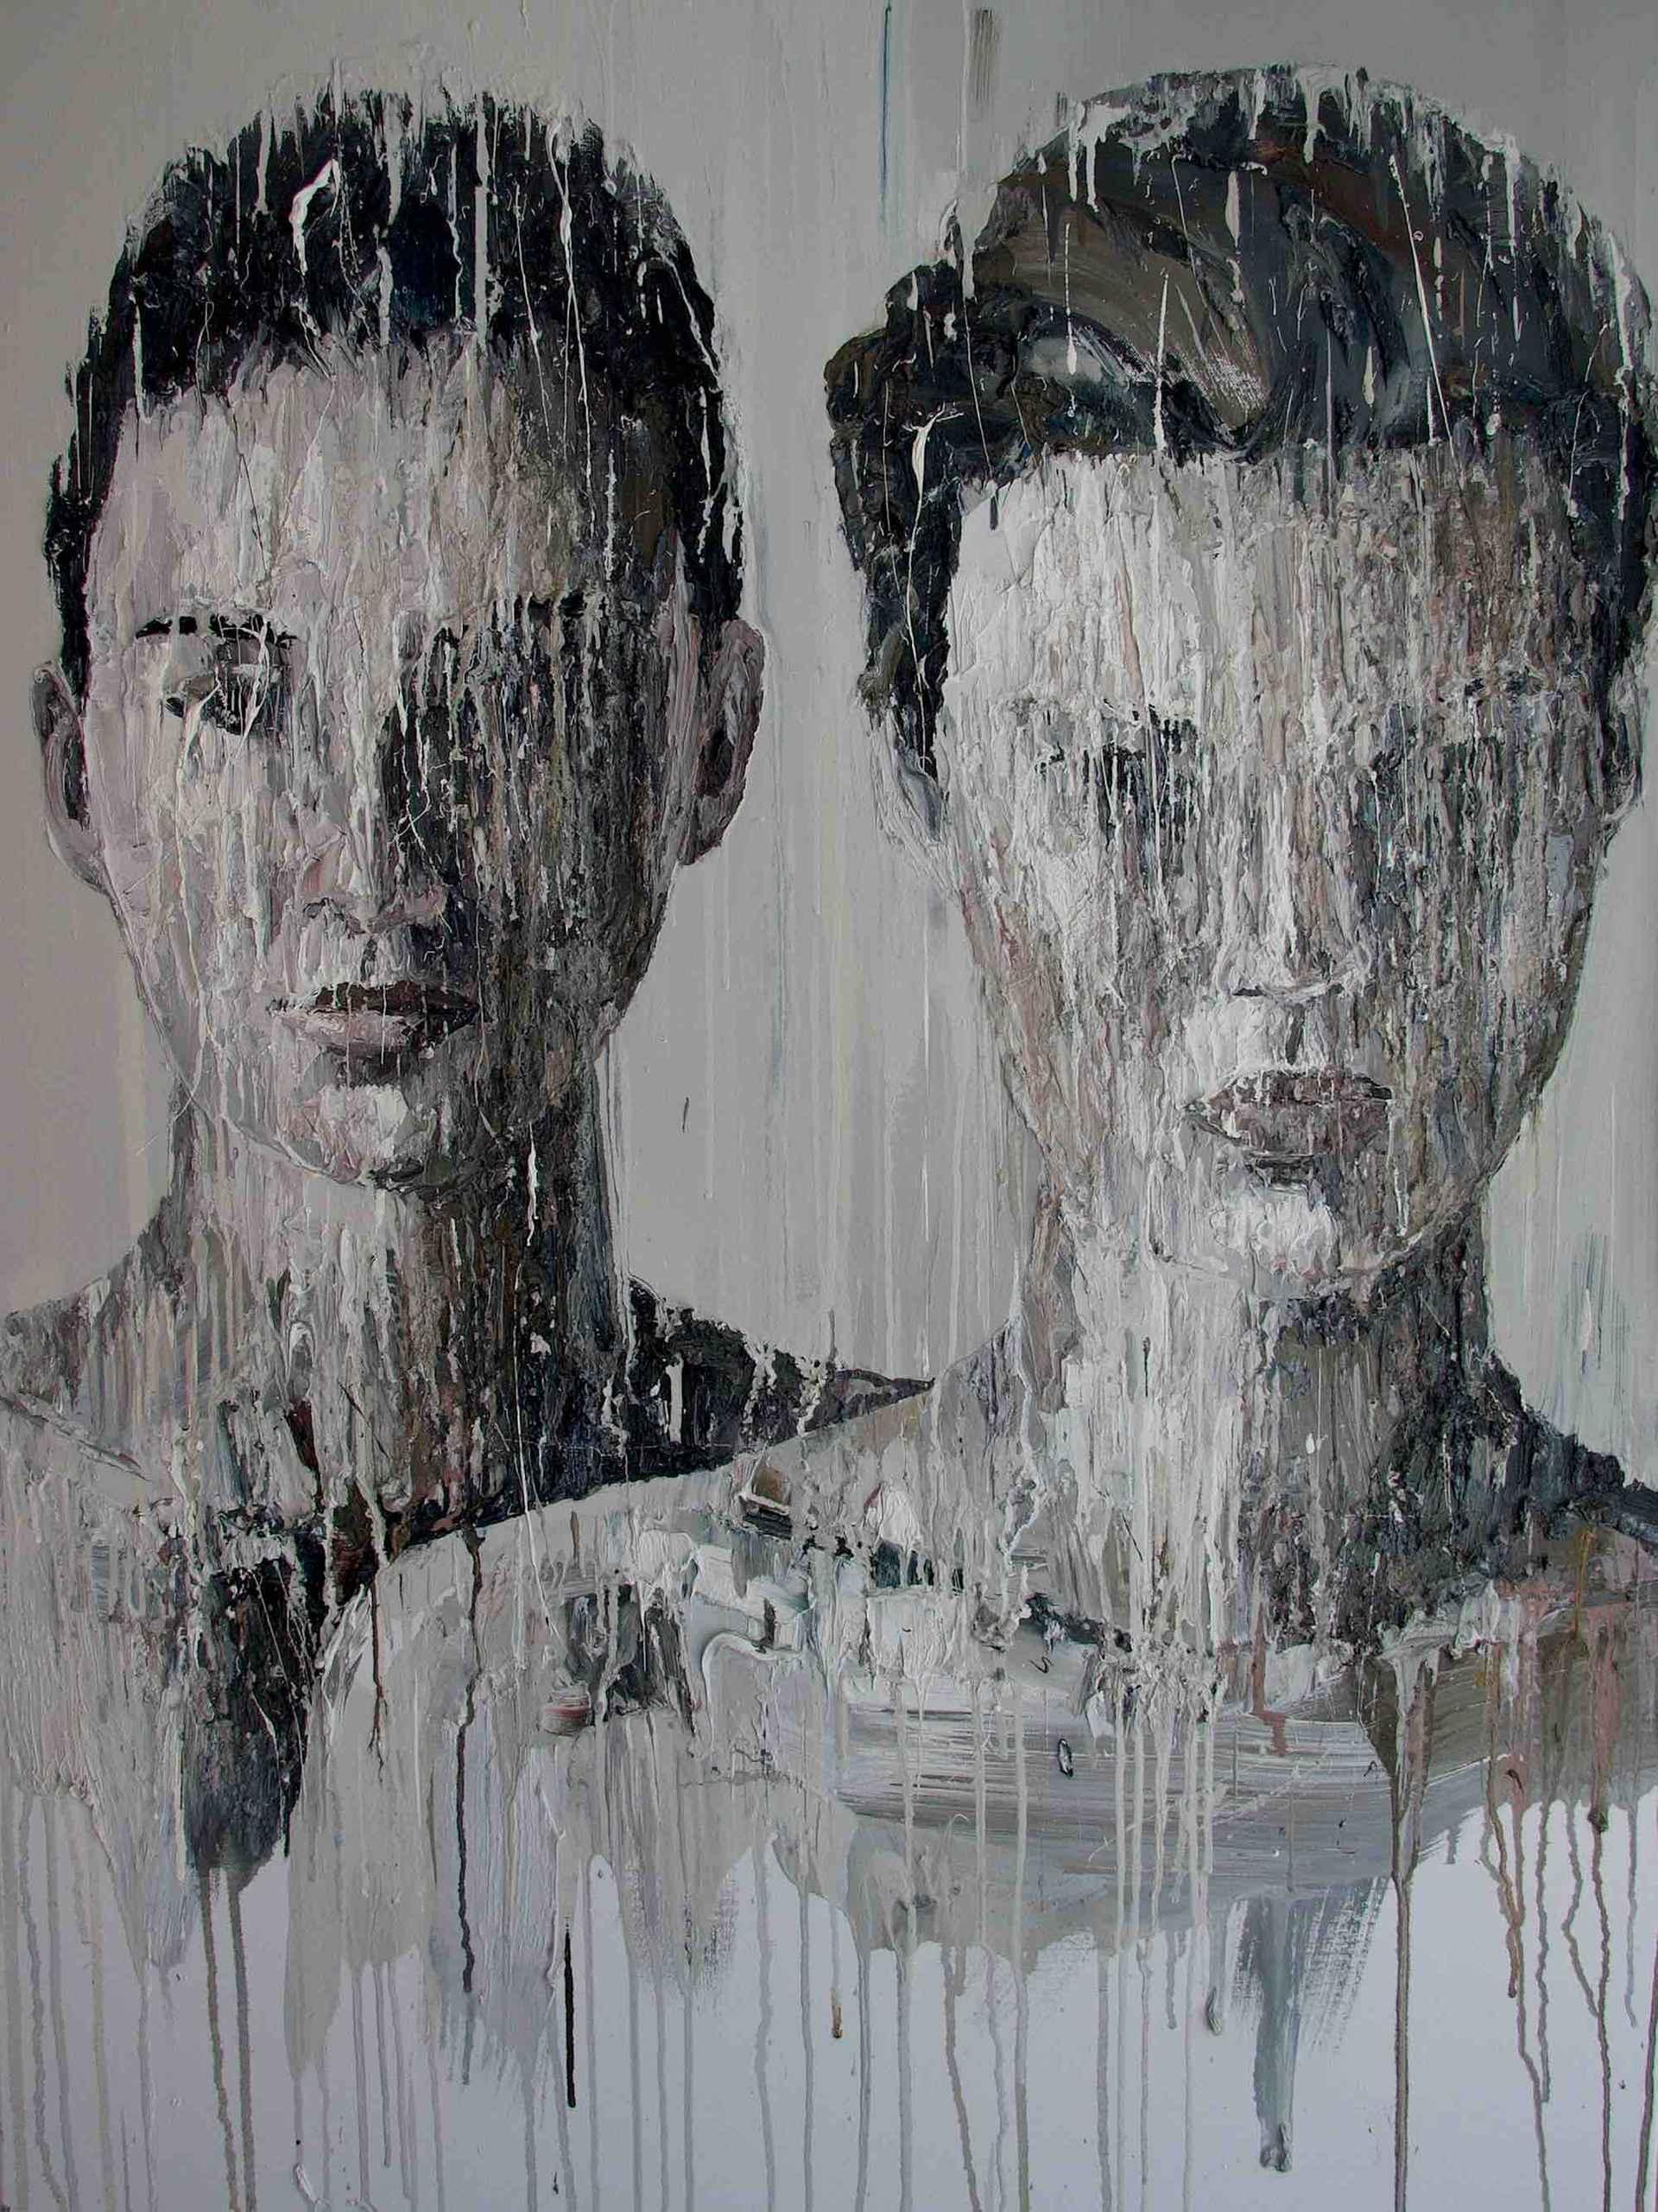 Ida & Lucia by Carl Melegari